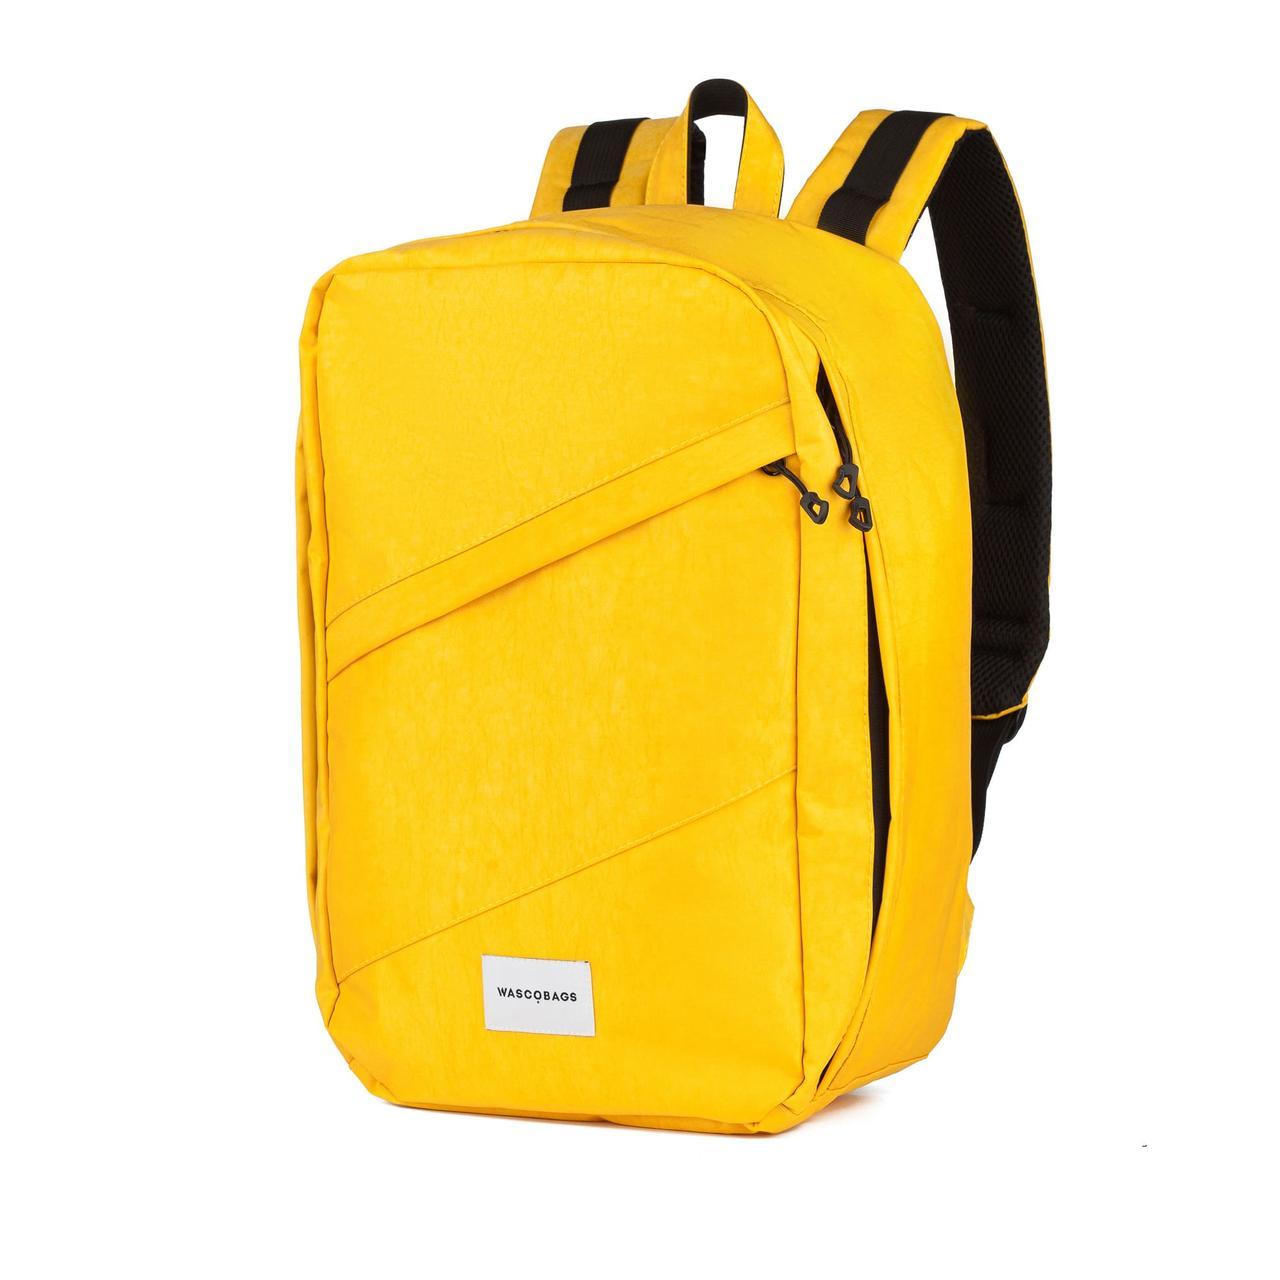 Рюкзак для ручной клади Wascobags 40x20x25 RW Желтый NY